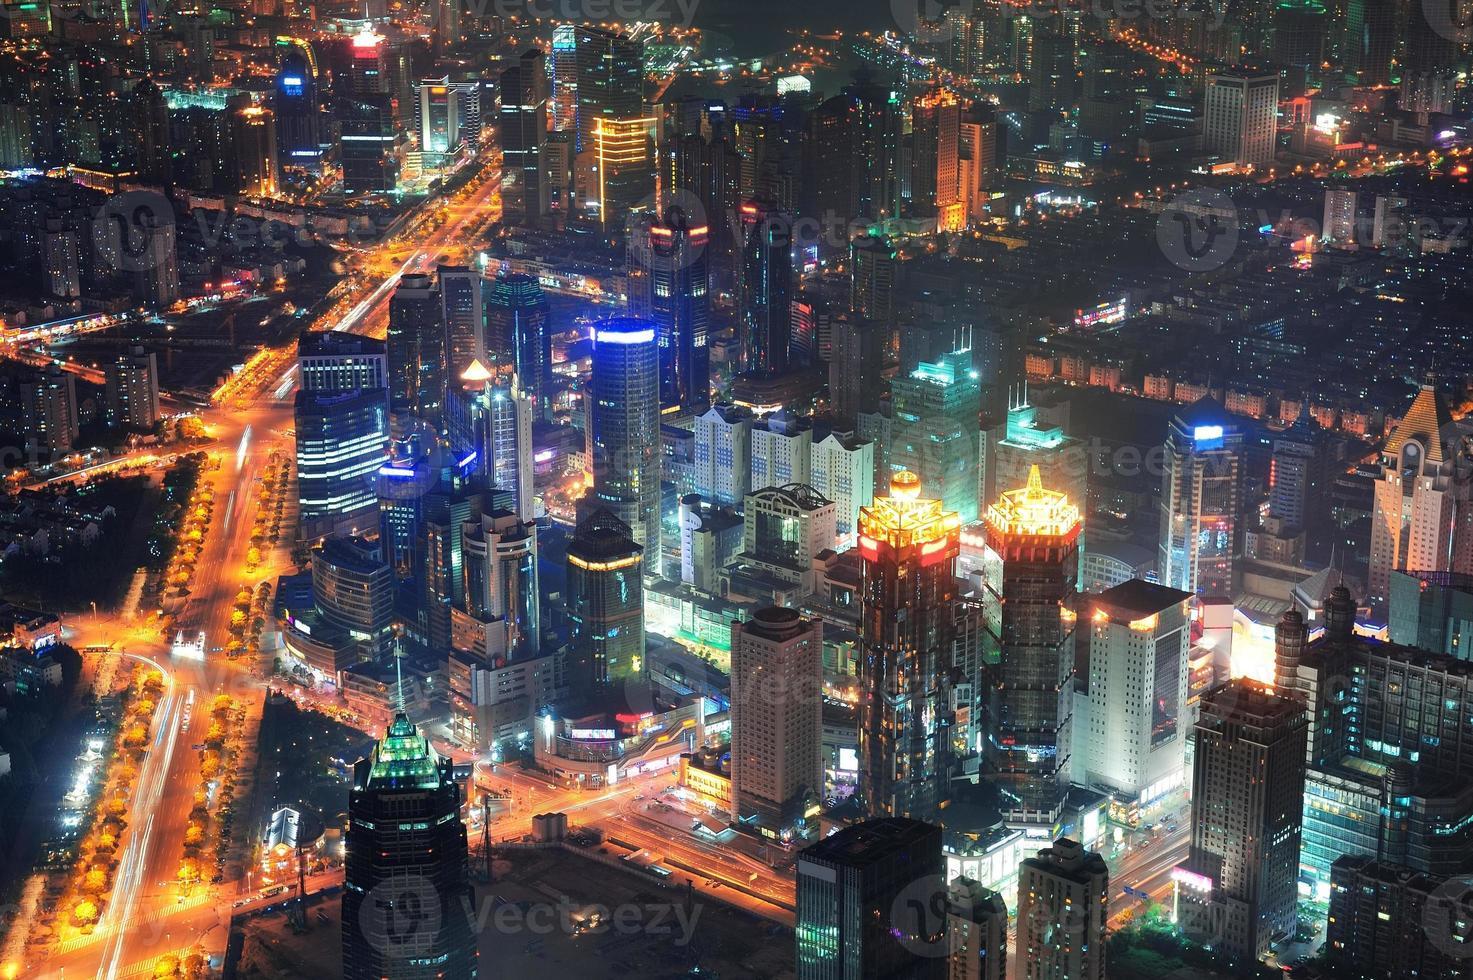 Shanghai night aerial view photo